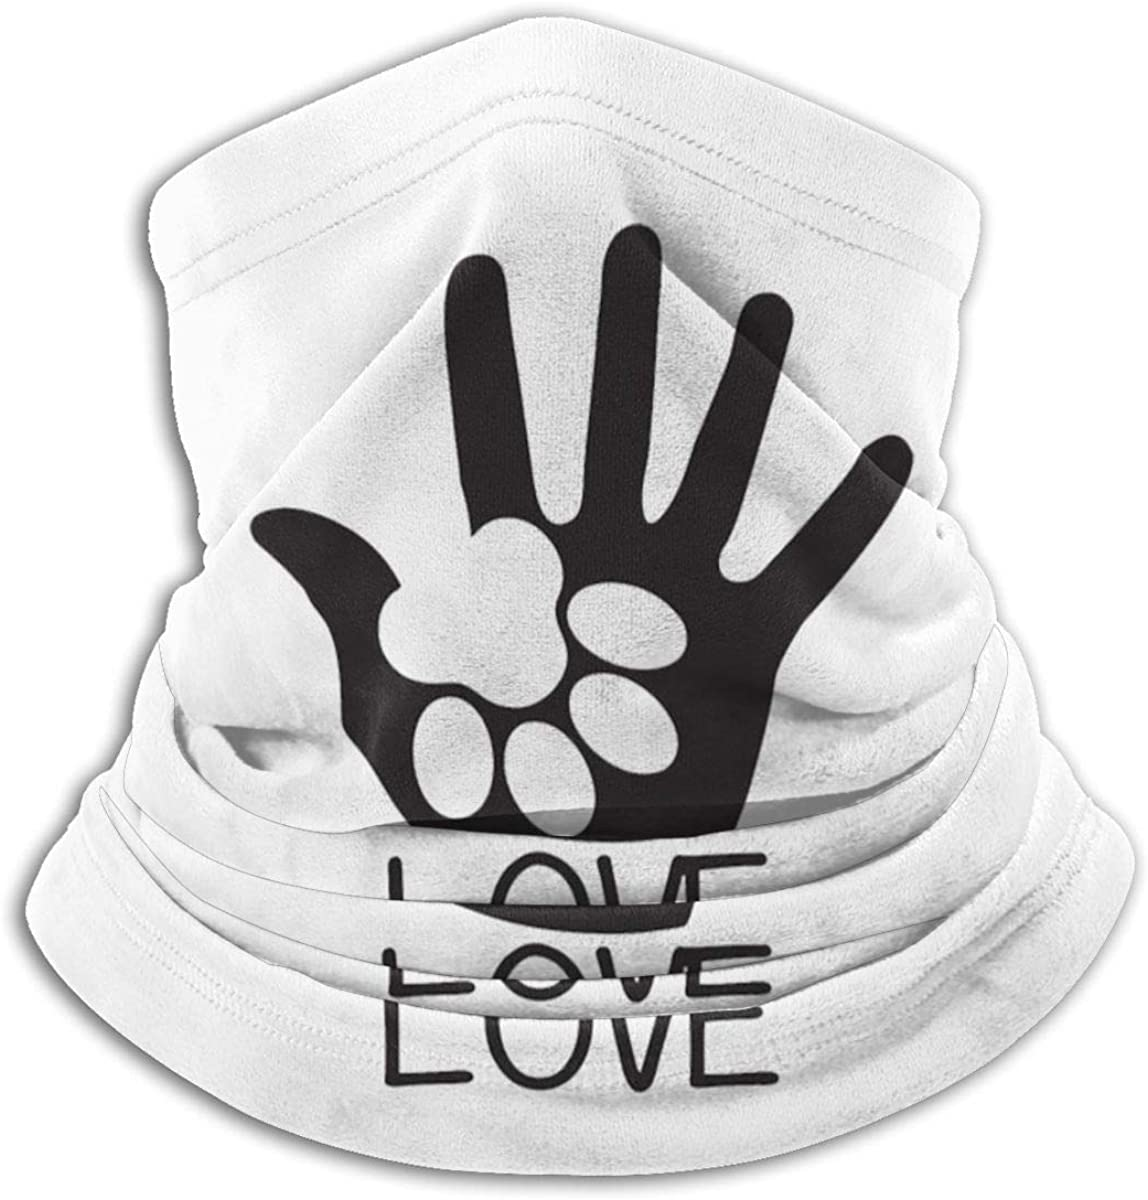 Dog Paw Love Black Multi-function Neck Warmer Gaiter Polyester Neck Warmer Windproof Winter Neck Gaiter Cold Weather Scarf For Men Women